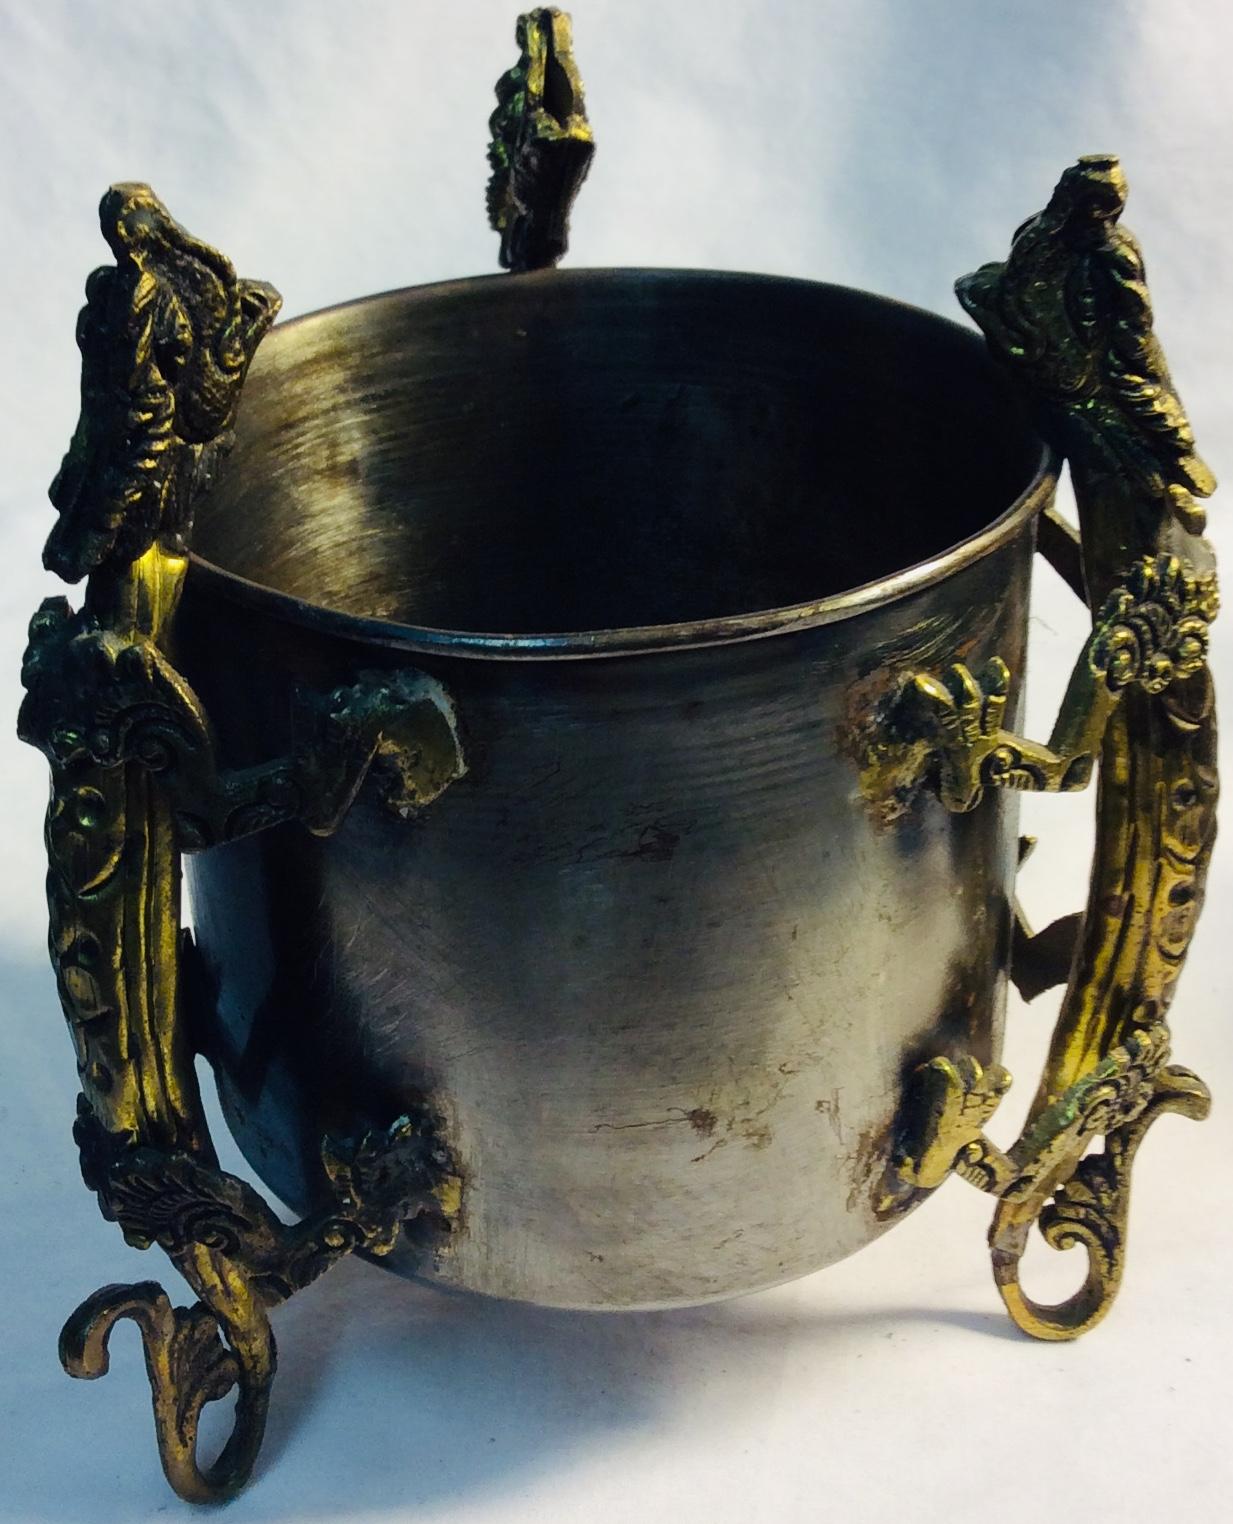 Medium silver cauldron with golden dragon details/handles